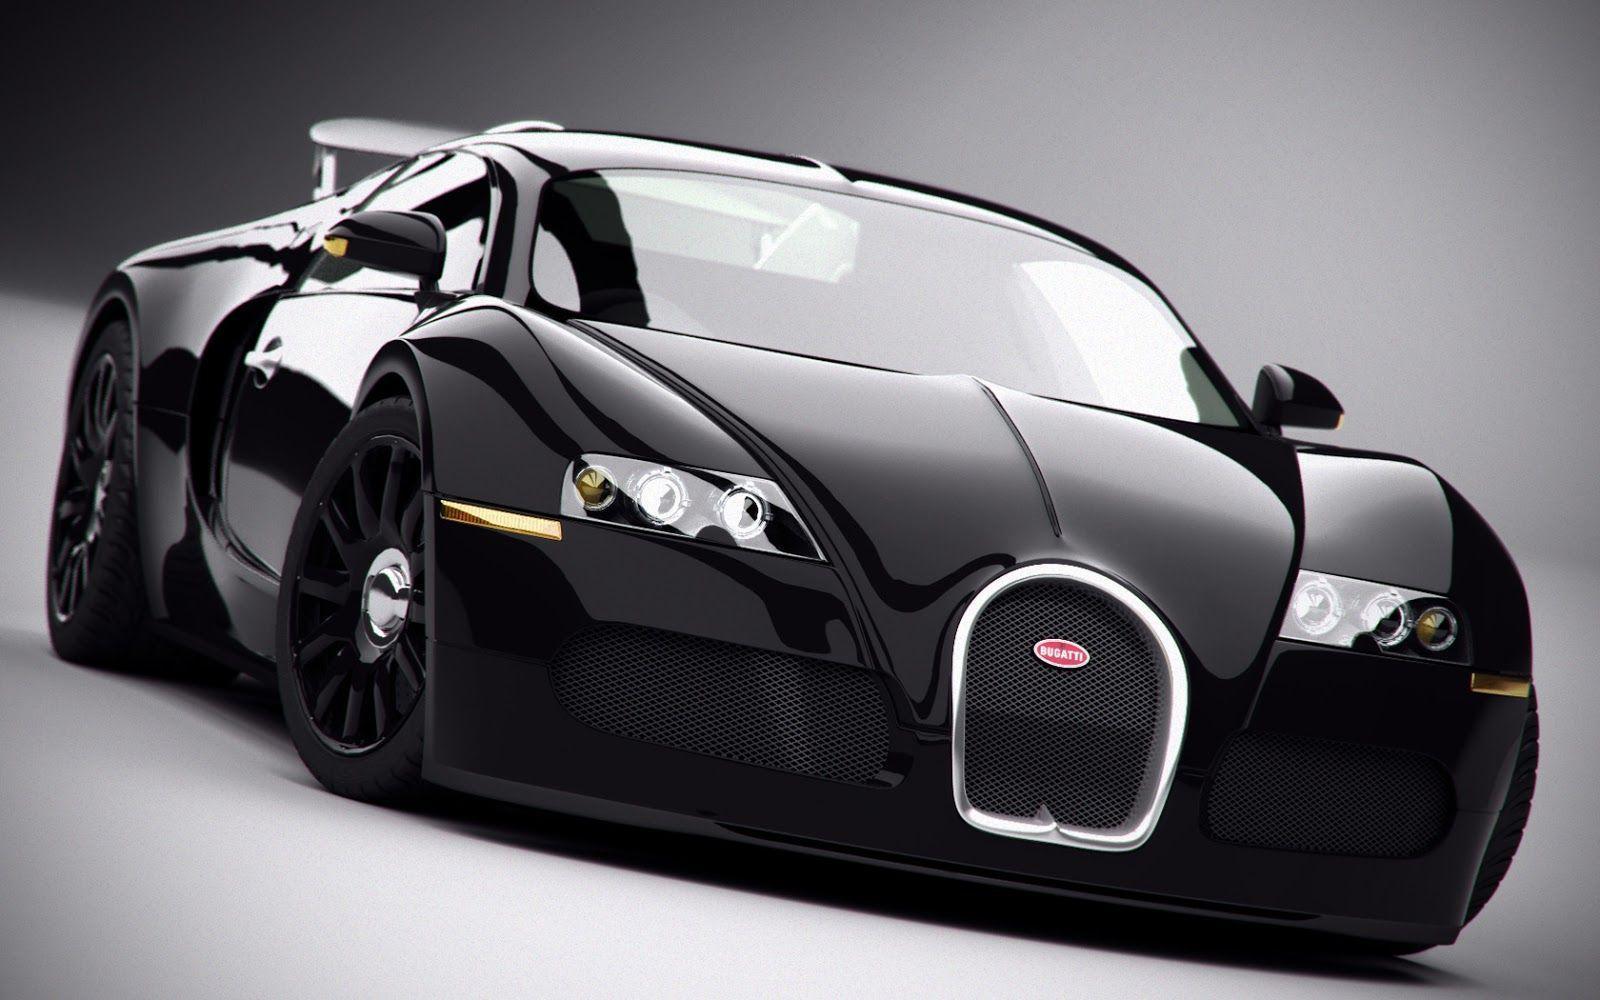 Jaguar Sports Car Wallpapers Top Free Jaguar Sports Car